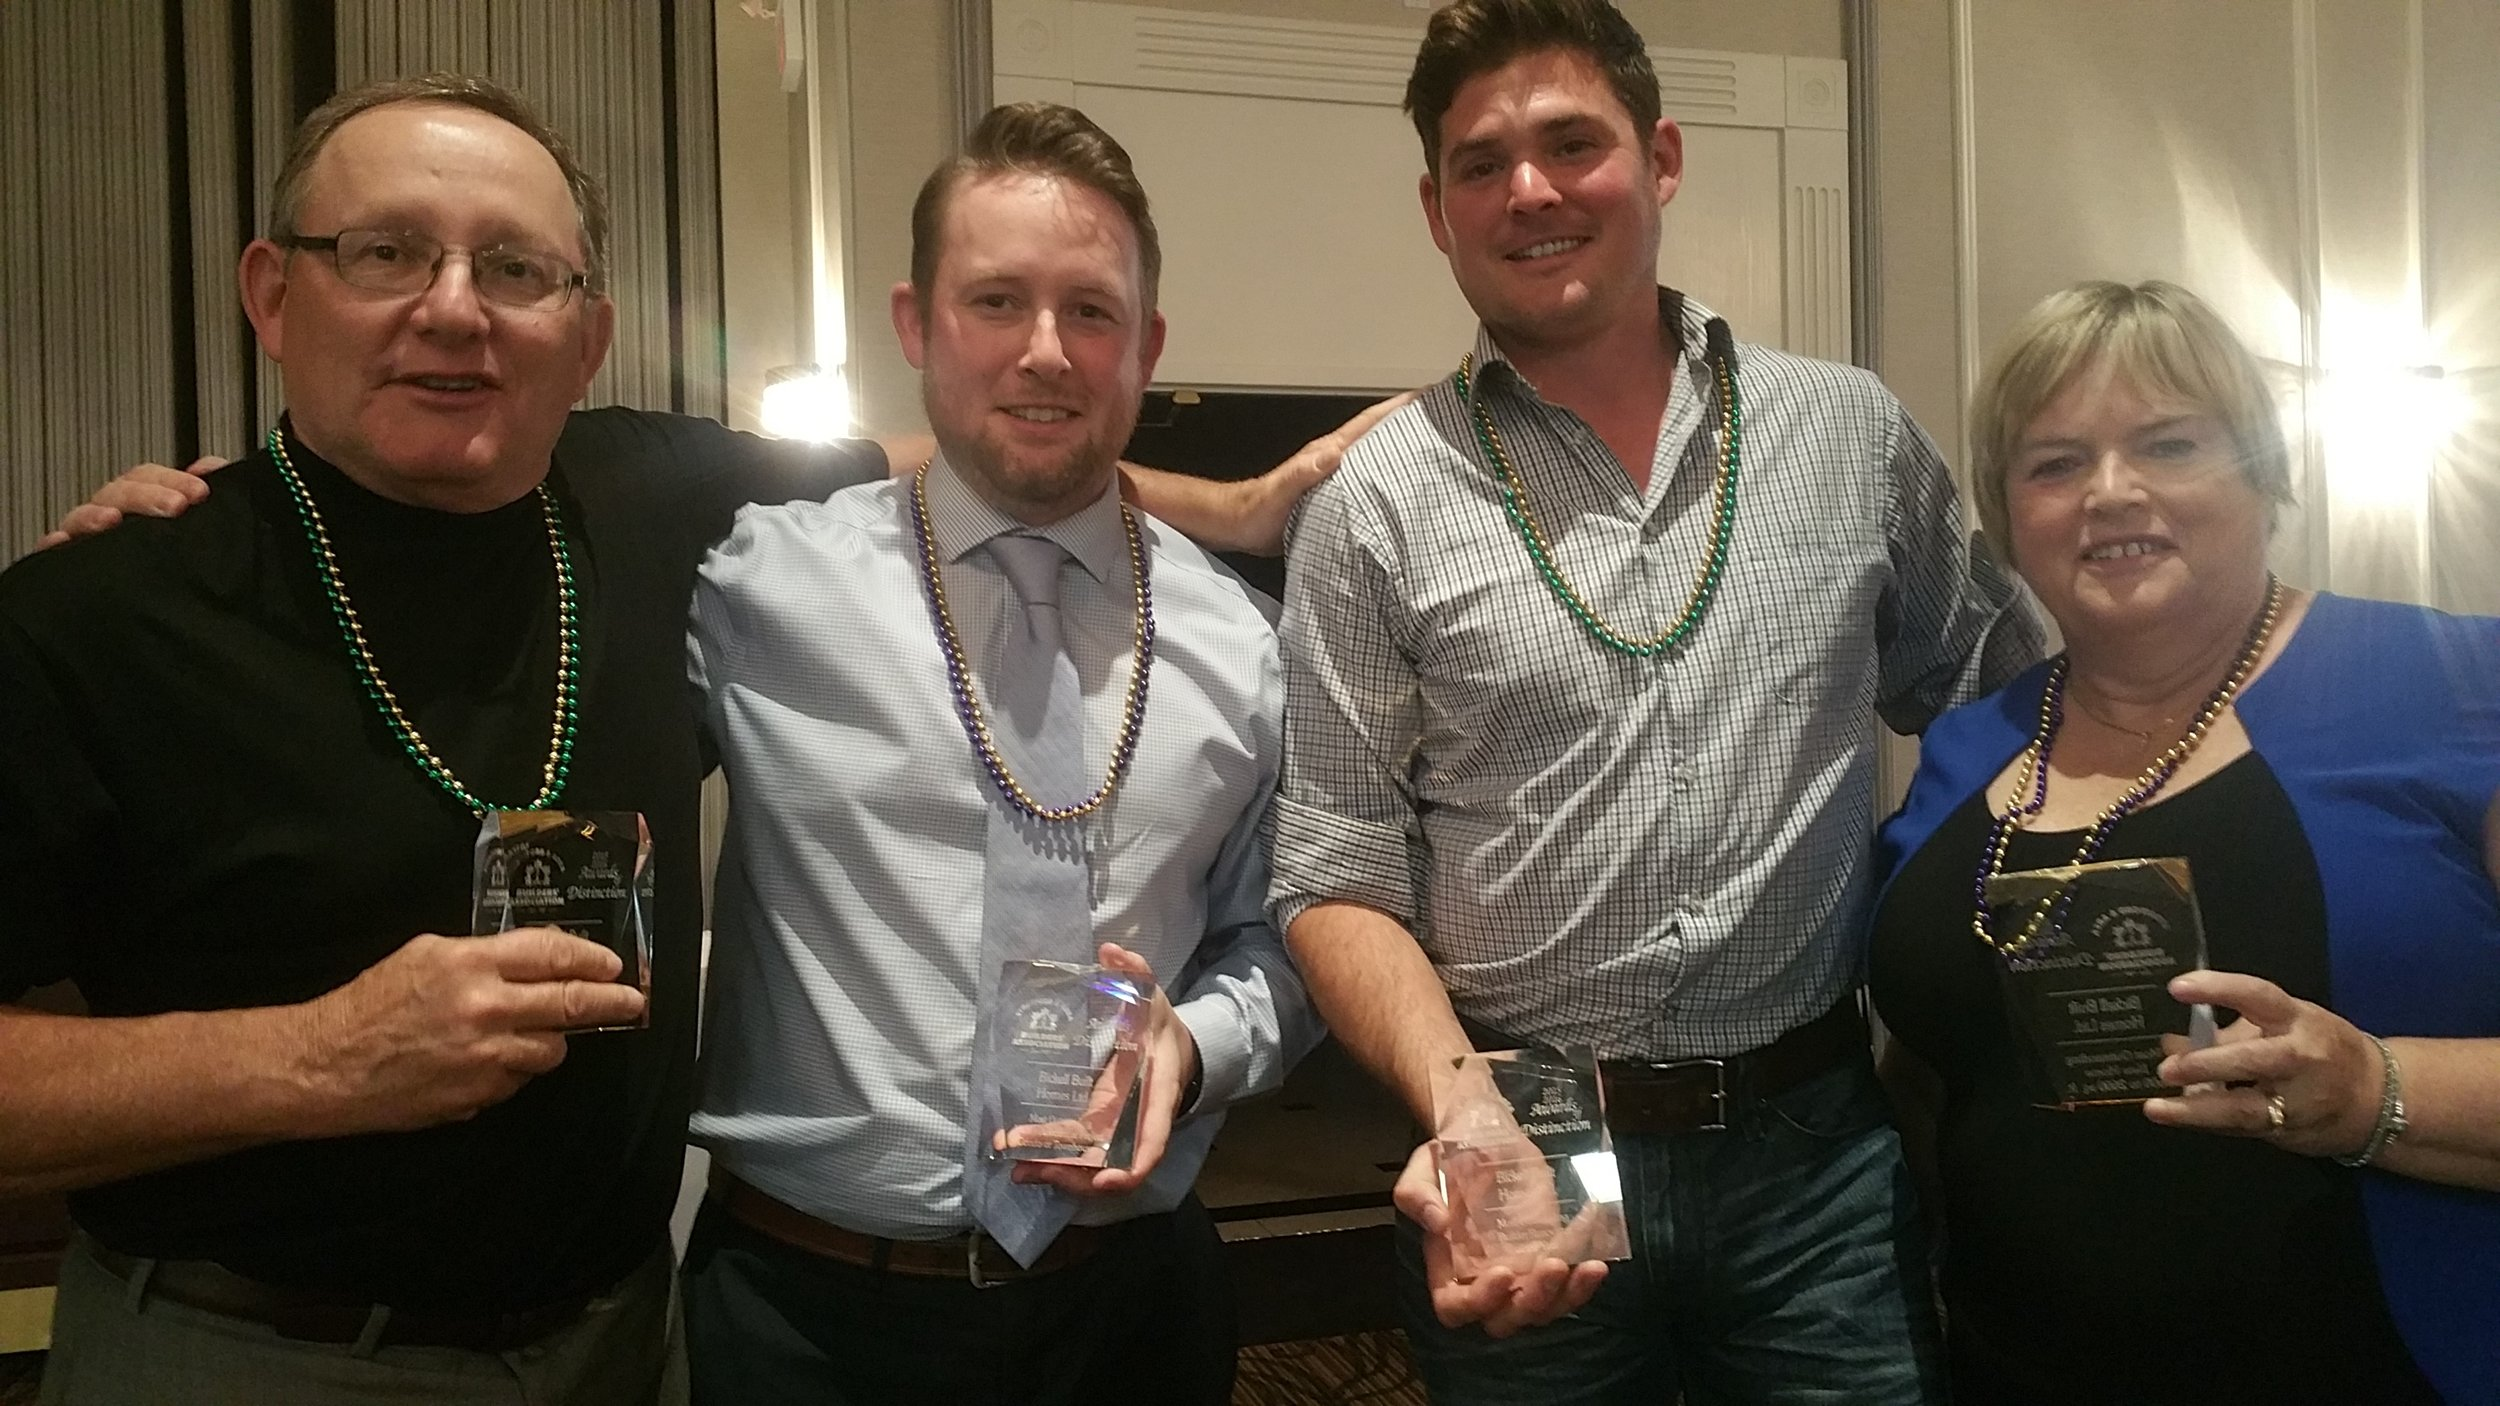 2016 staff with awards 06-09-16.jpg